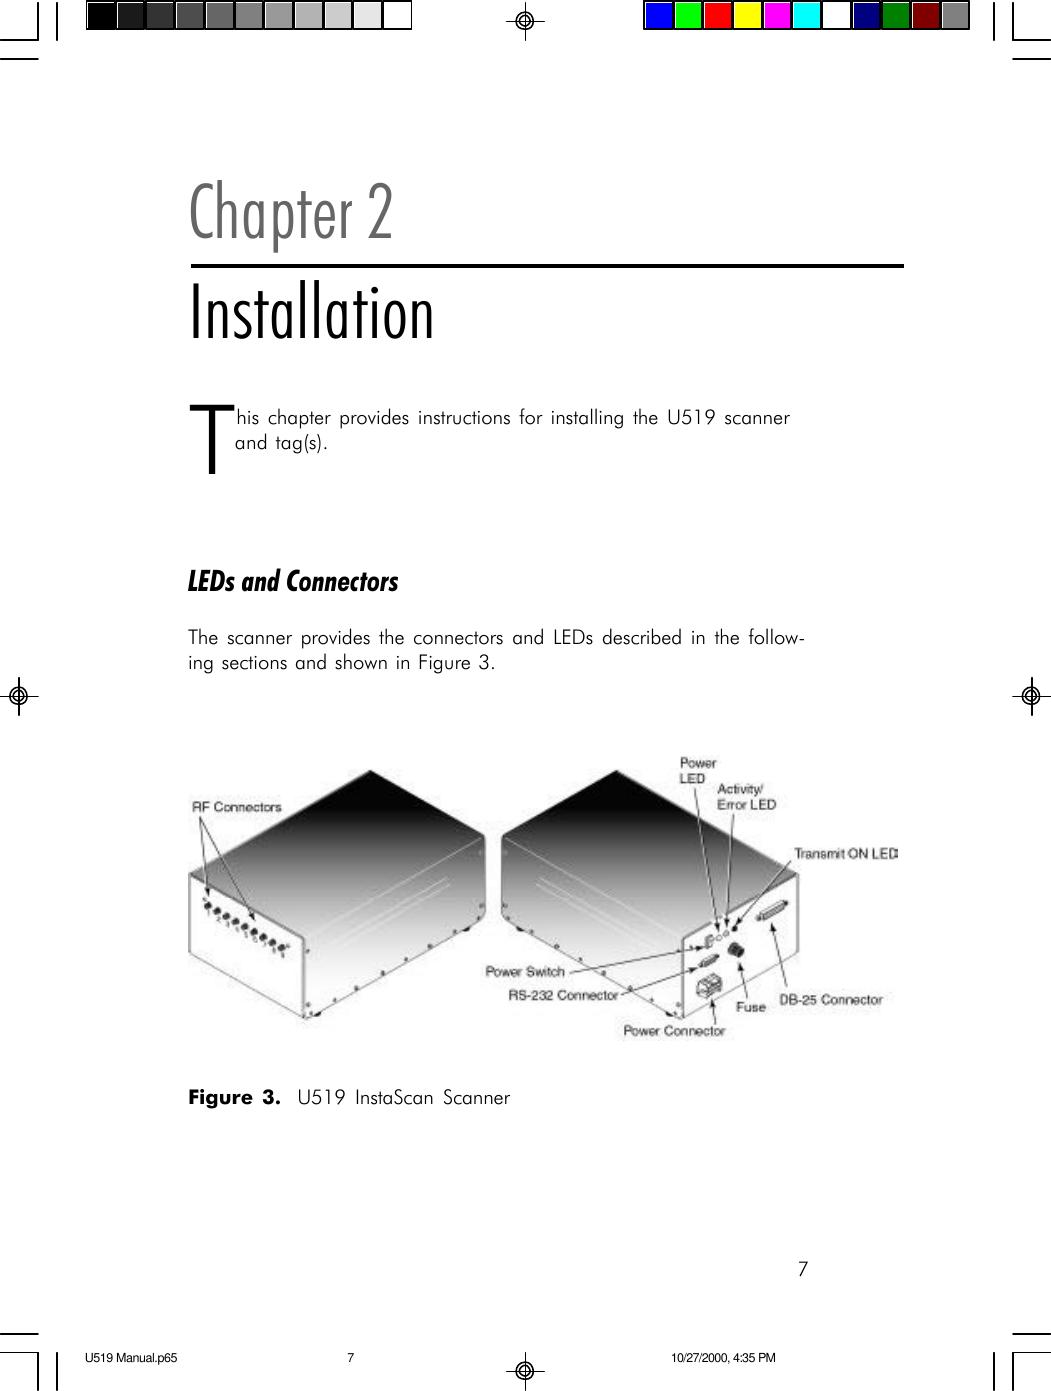 Single Chip Systems U519 9 Antenna InstaScan Scanner, Model